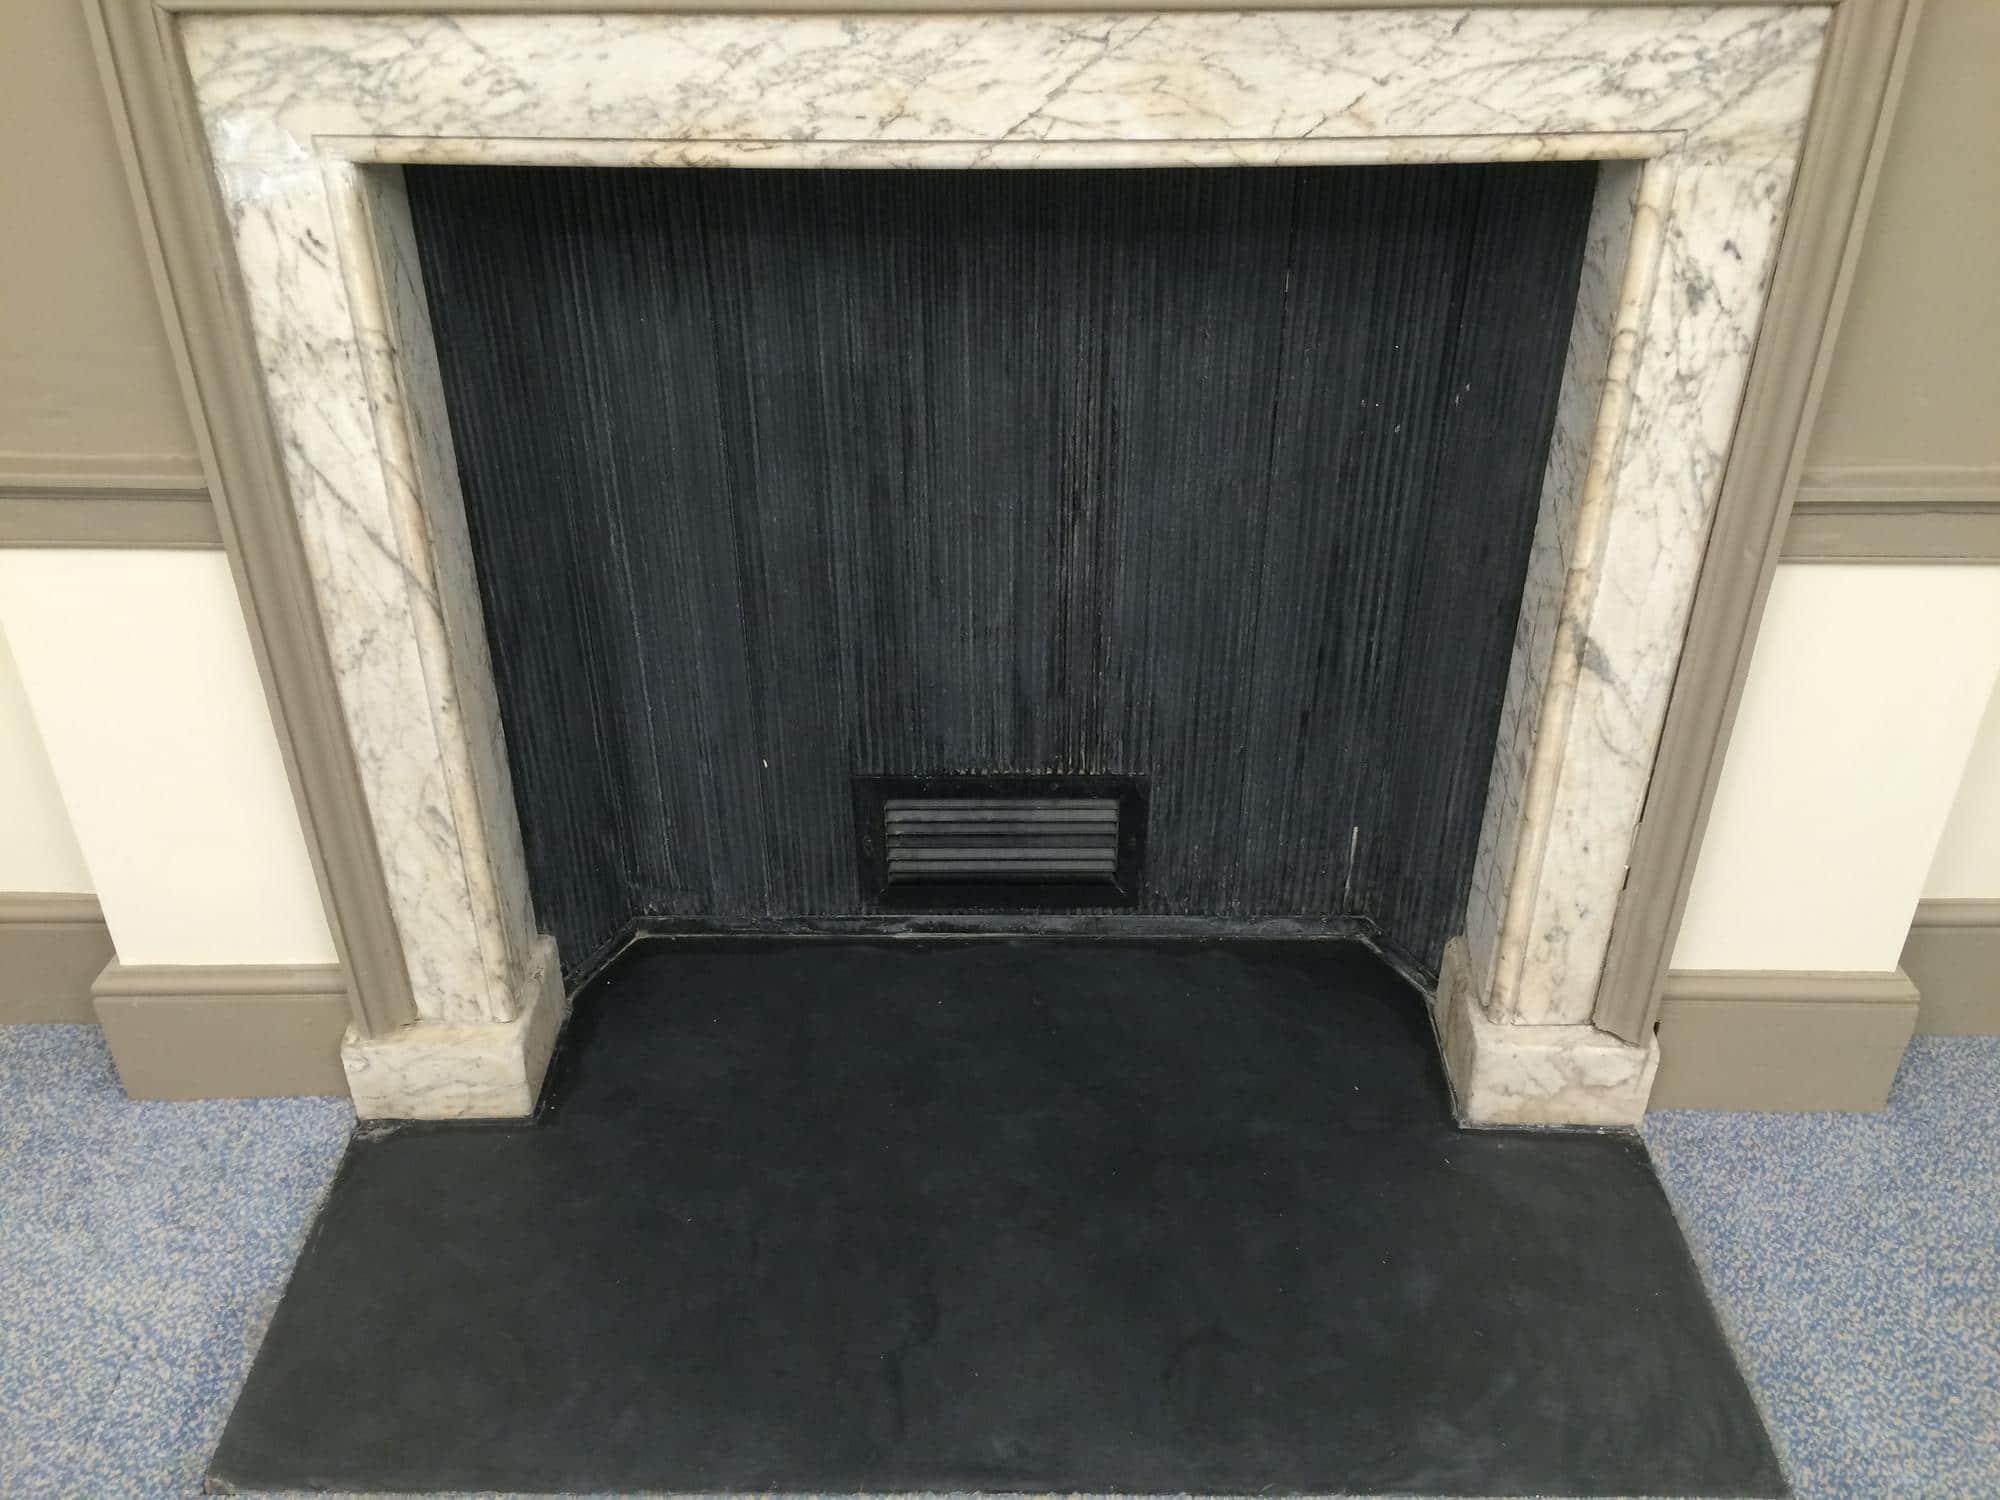 Bespoke Repairs Ltd Uk Stone Glass Repair Traditional Marble Fireplace Restoration 4